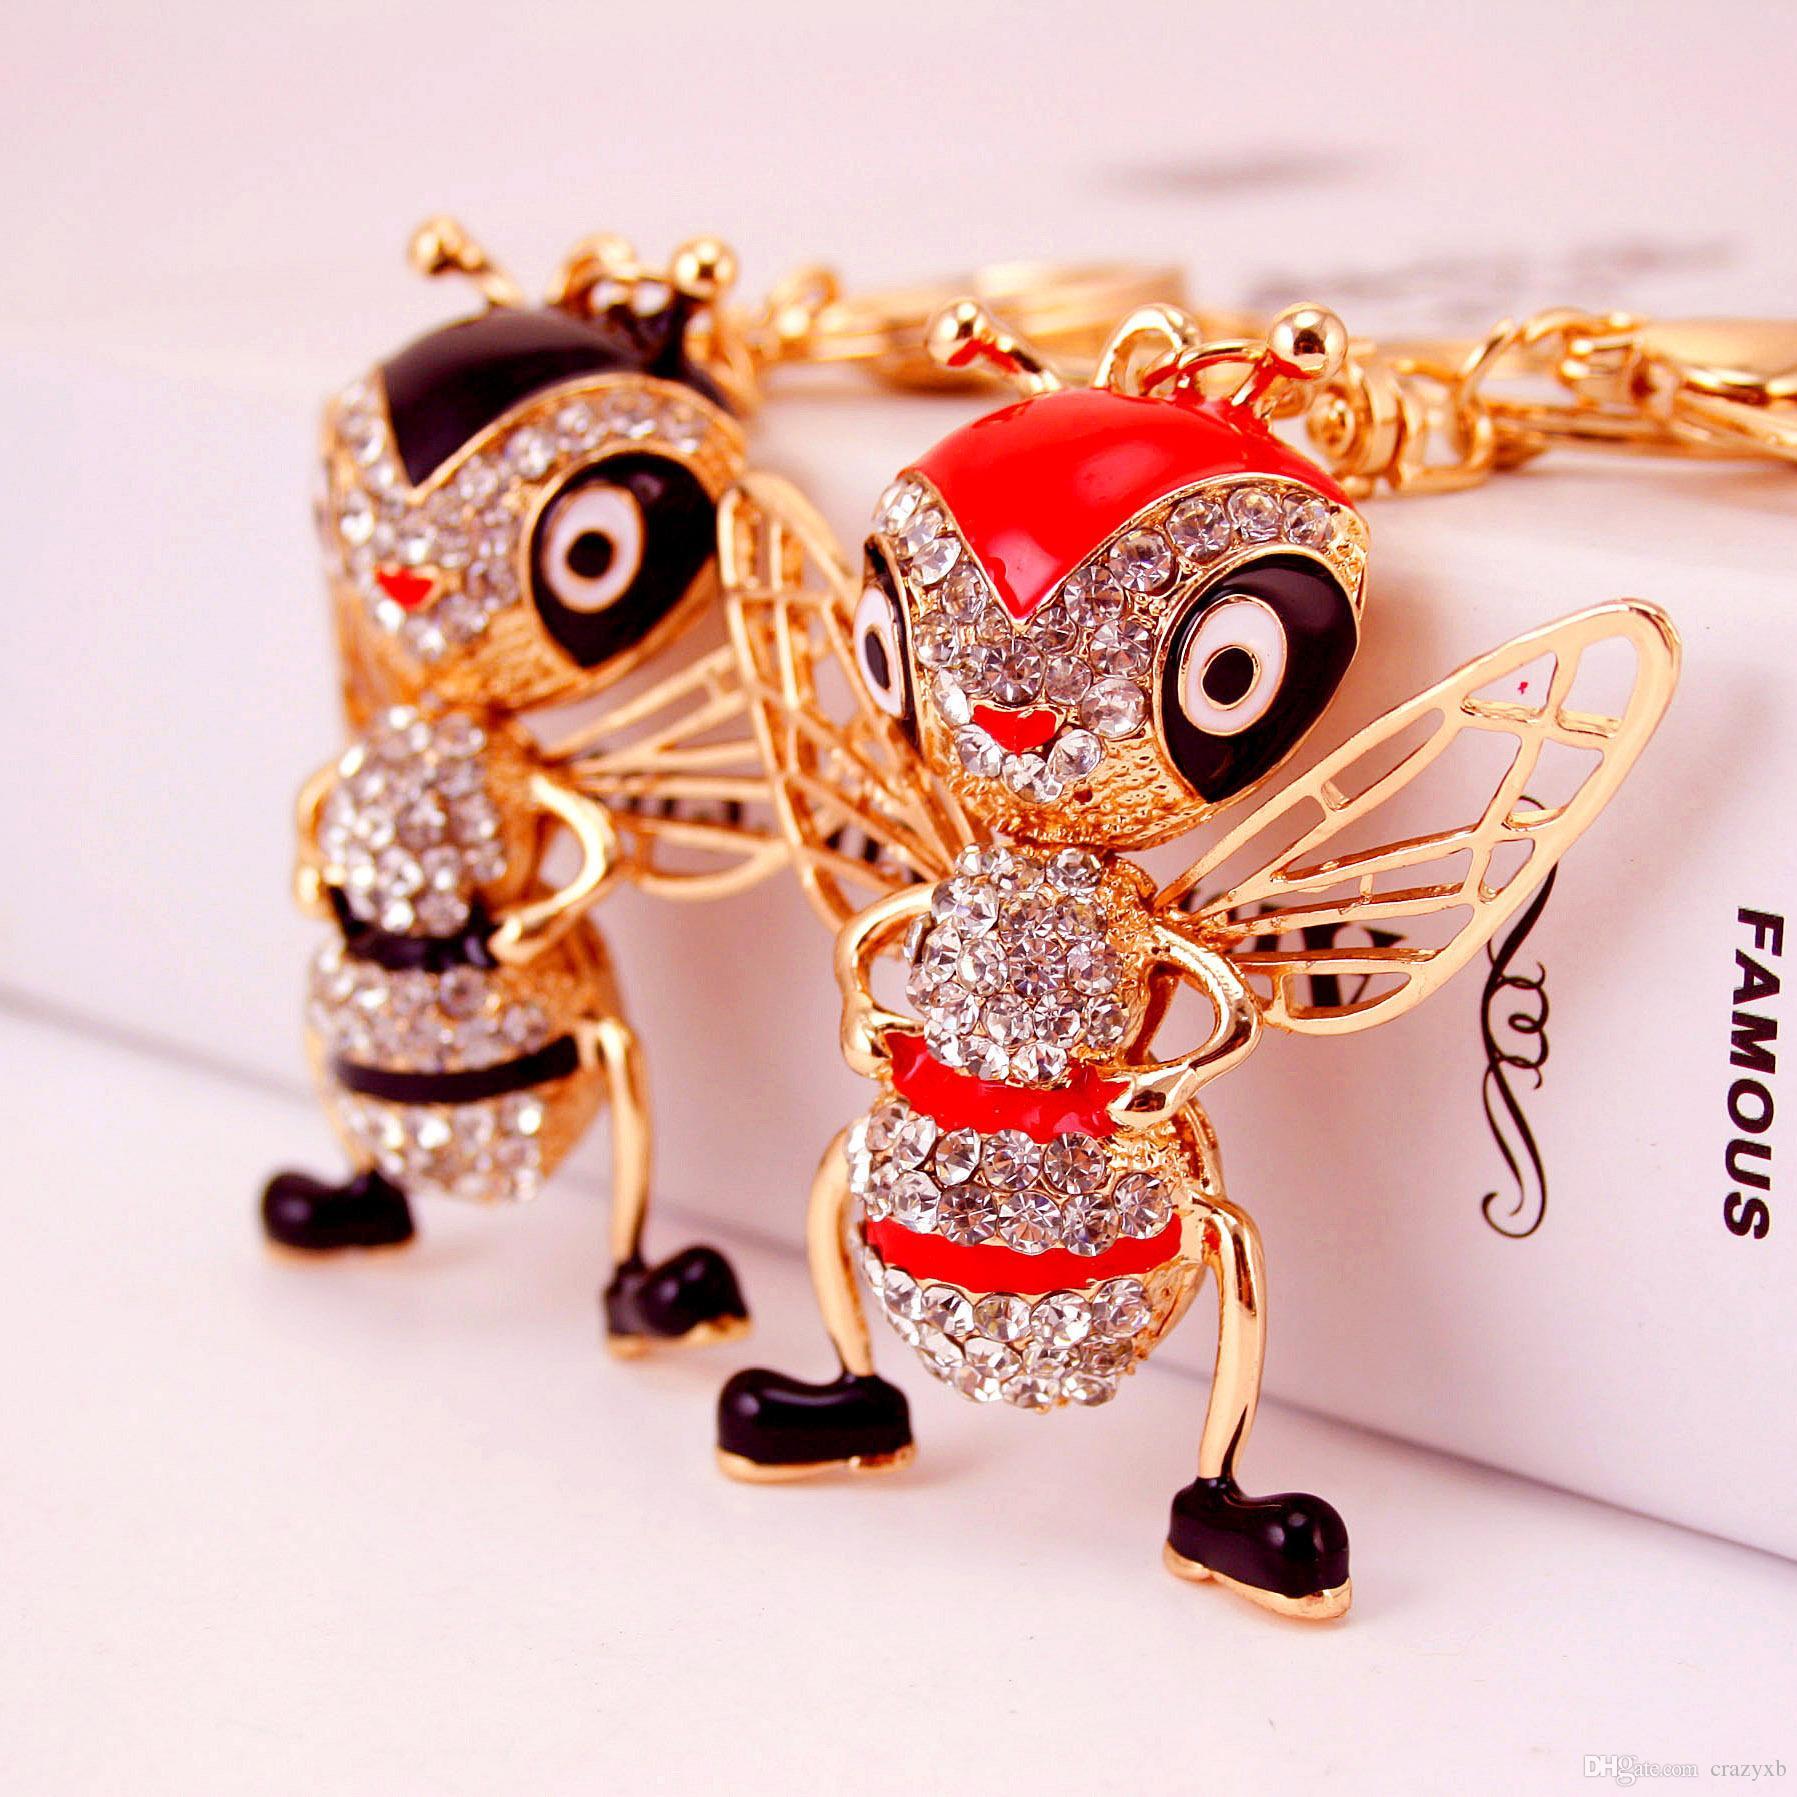 Enamel Alloy Jungle Animal Key Chain Bee Key Ring for Women Bag Handbag Charm Jewelry Keychain Car Key Holder